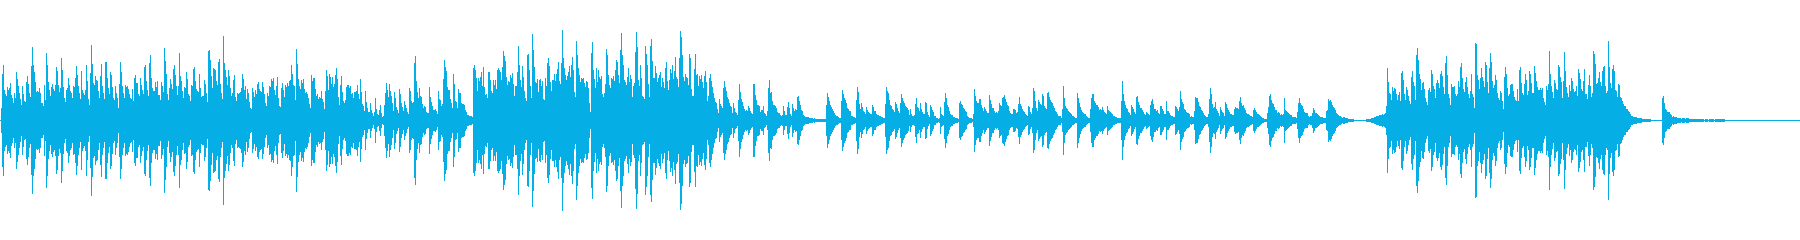 Piano 切ない Glocken オルの再生済みの波形